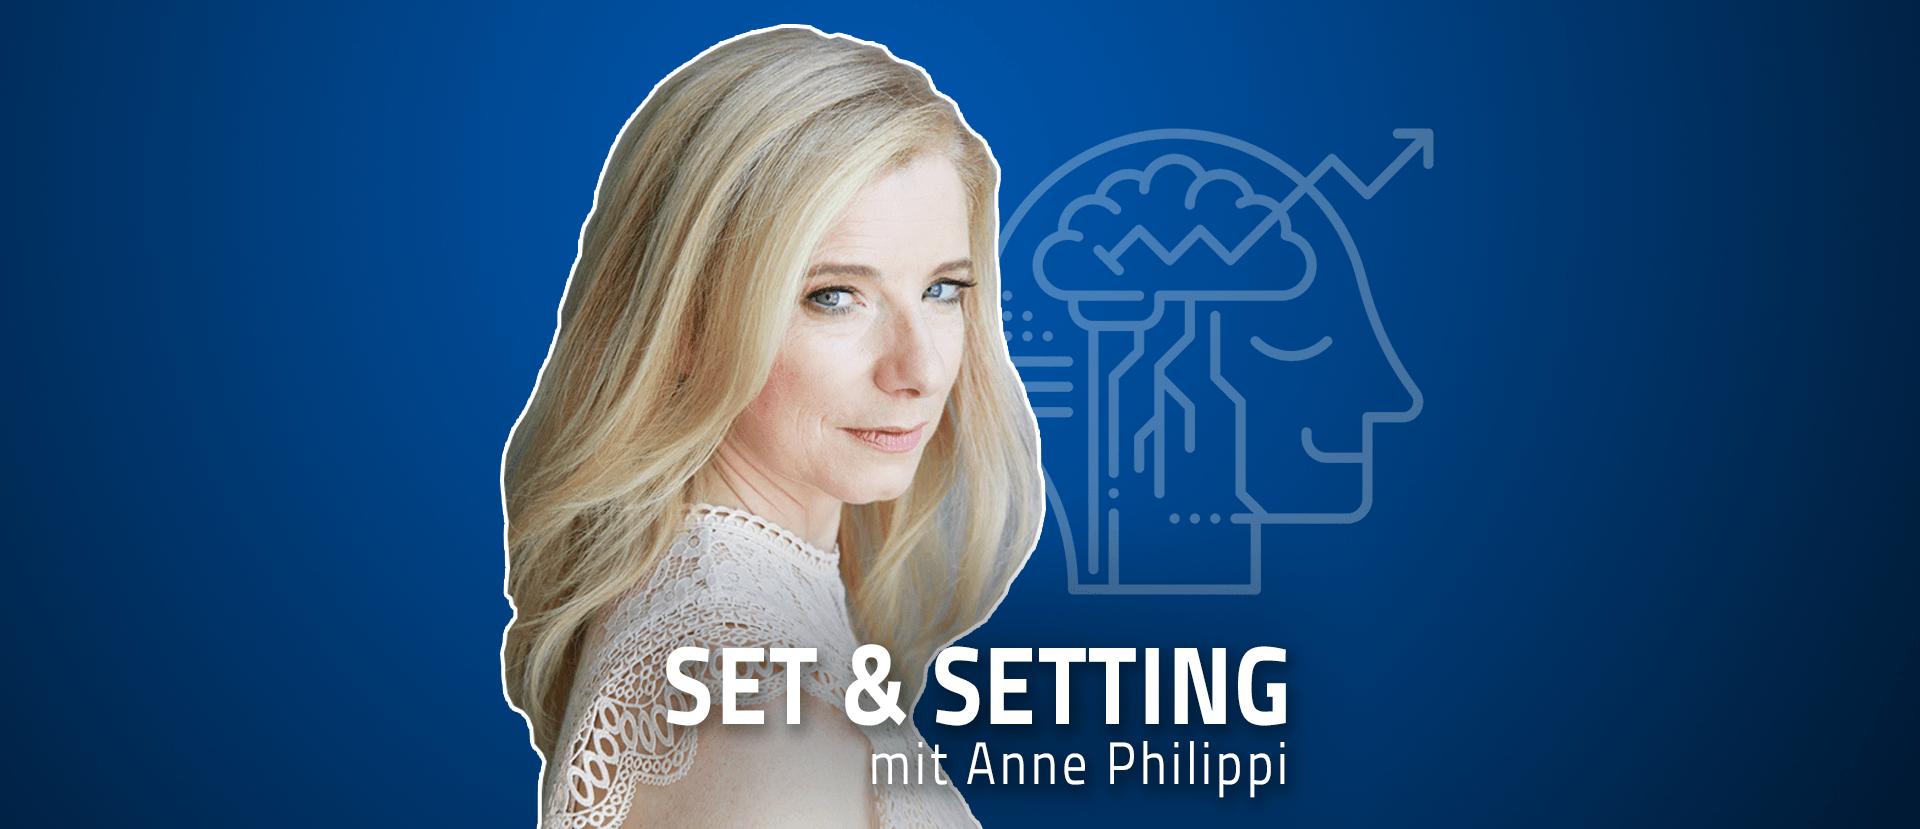 Anne Philippi, Psychedelika, Psychotherapie, Ketamin Therapie, Depression